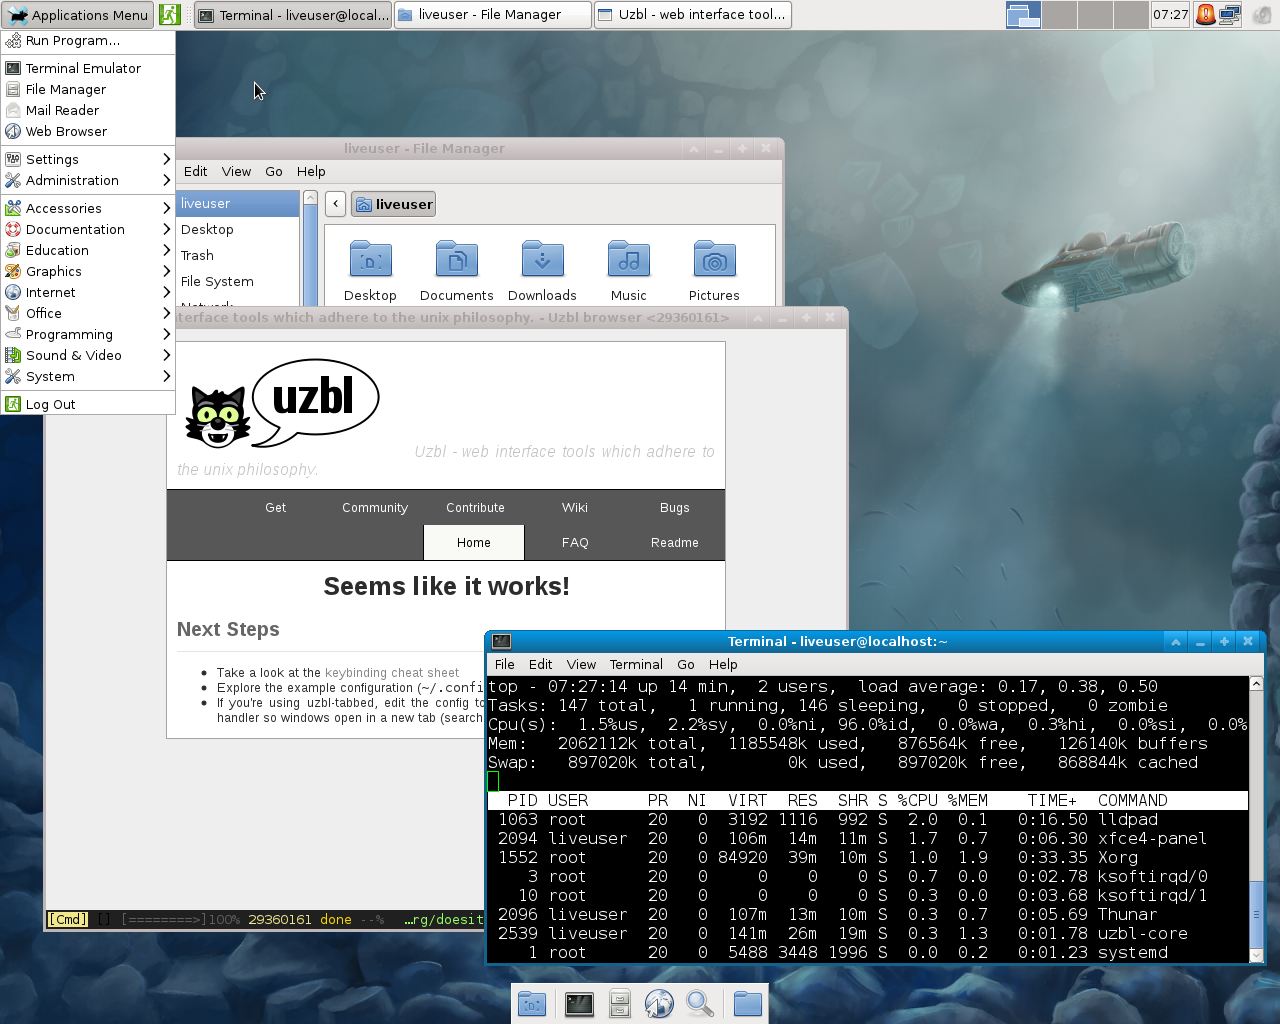 Share Your Desktop! 3 | Trisquel GNU/Linux - Run free!